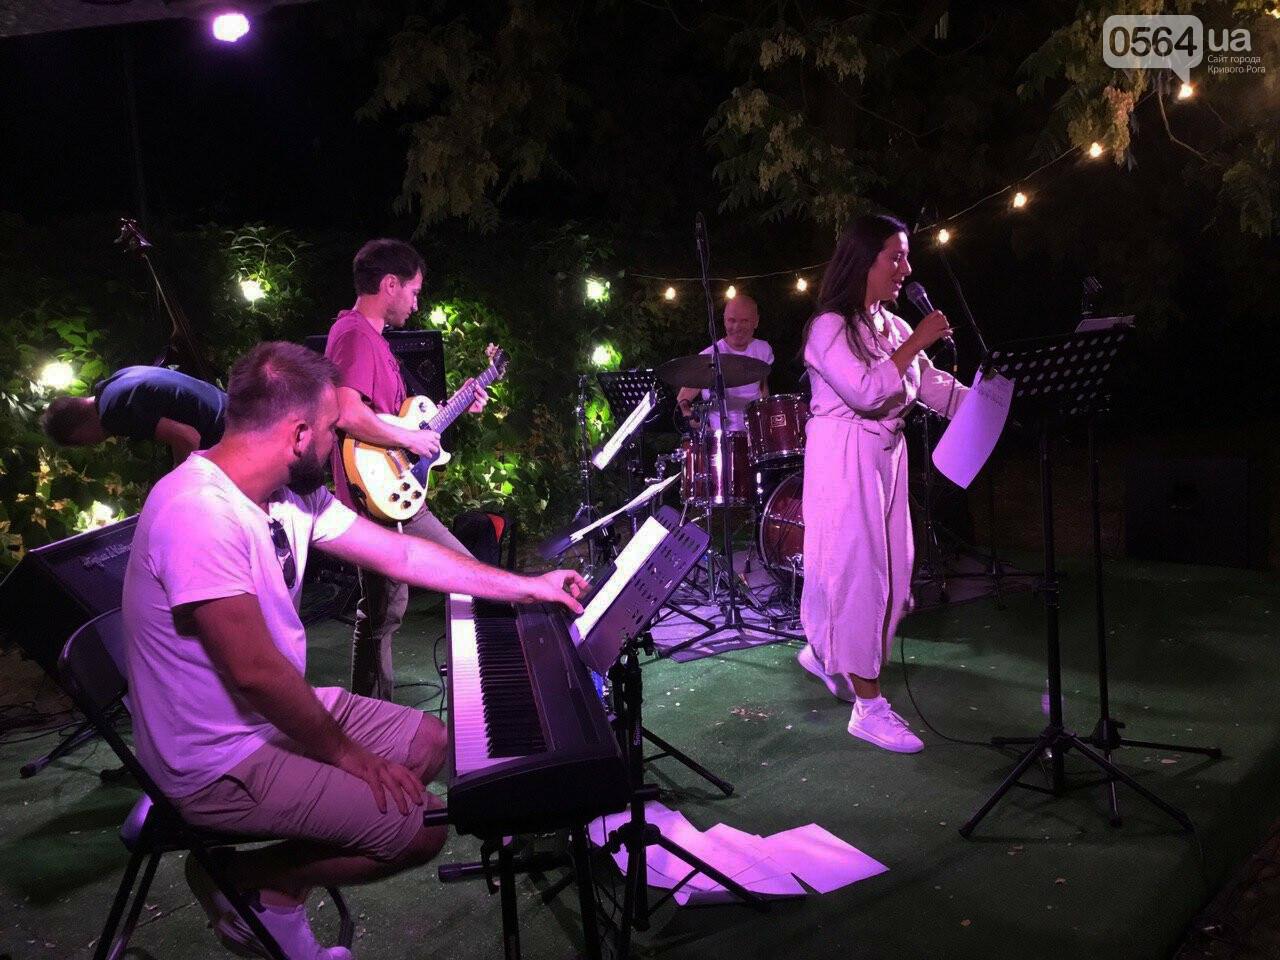 Под звездным небом криворожане наслаждались летним джазом от  Advantage Project, - ФОТО, ВИДЕО , фото-10